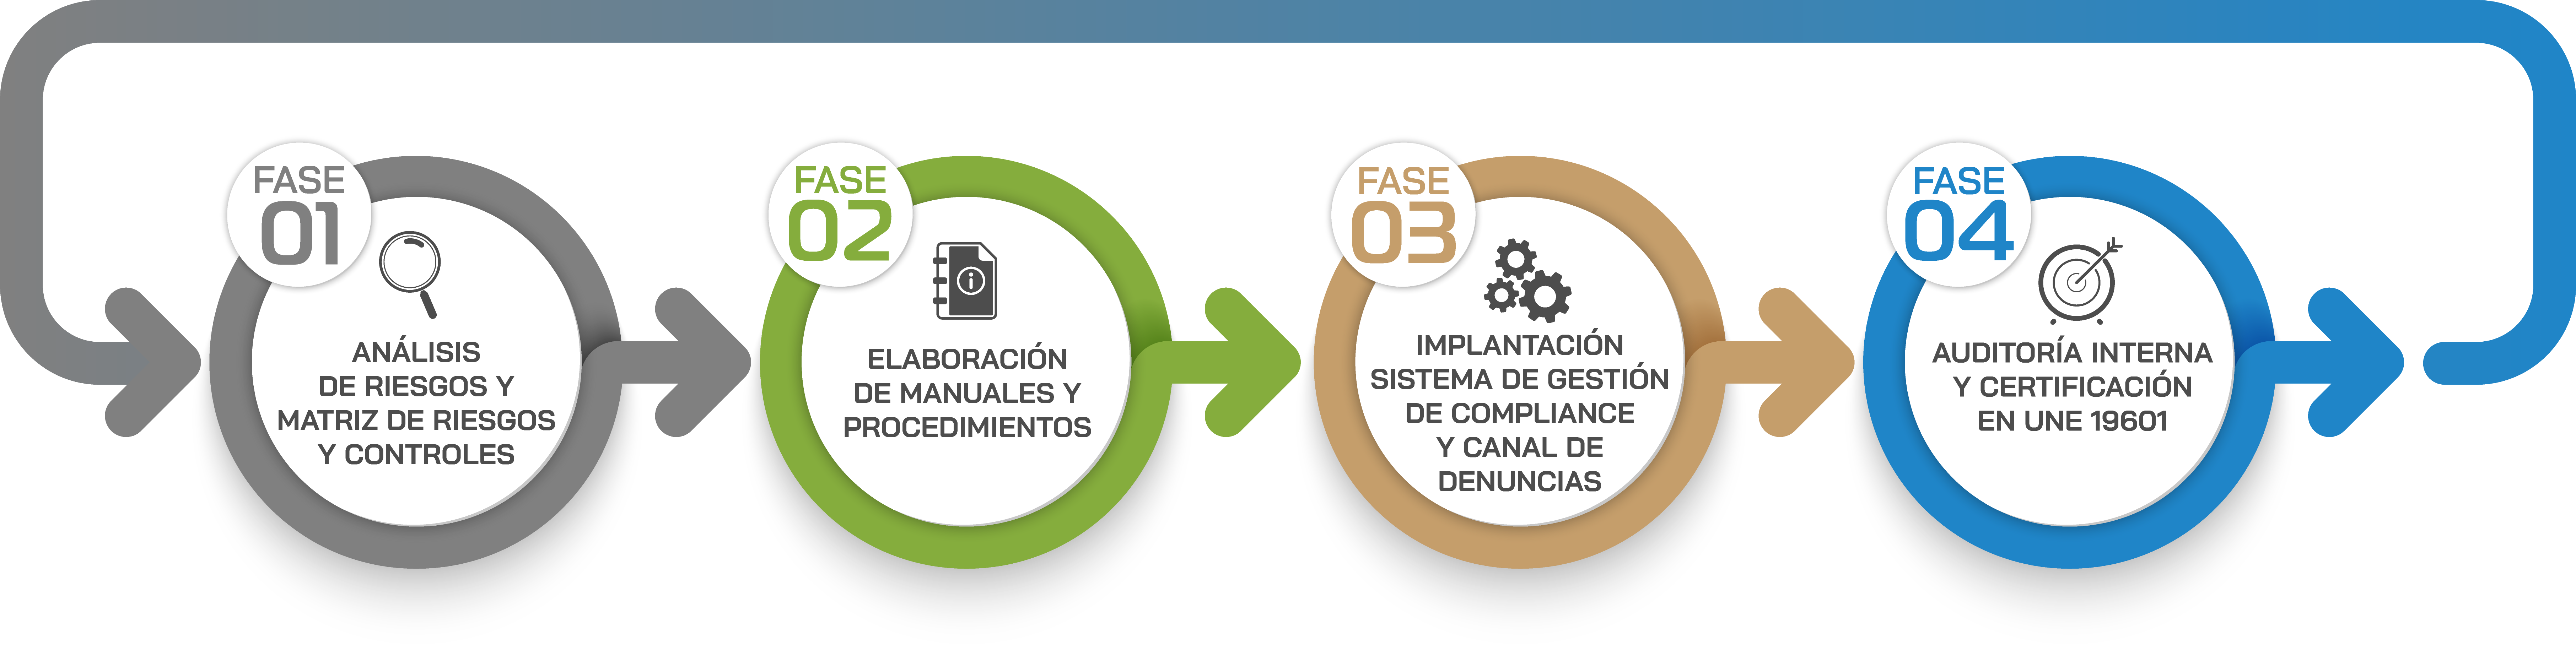 Fases del compliance